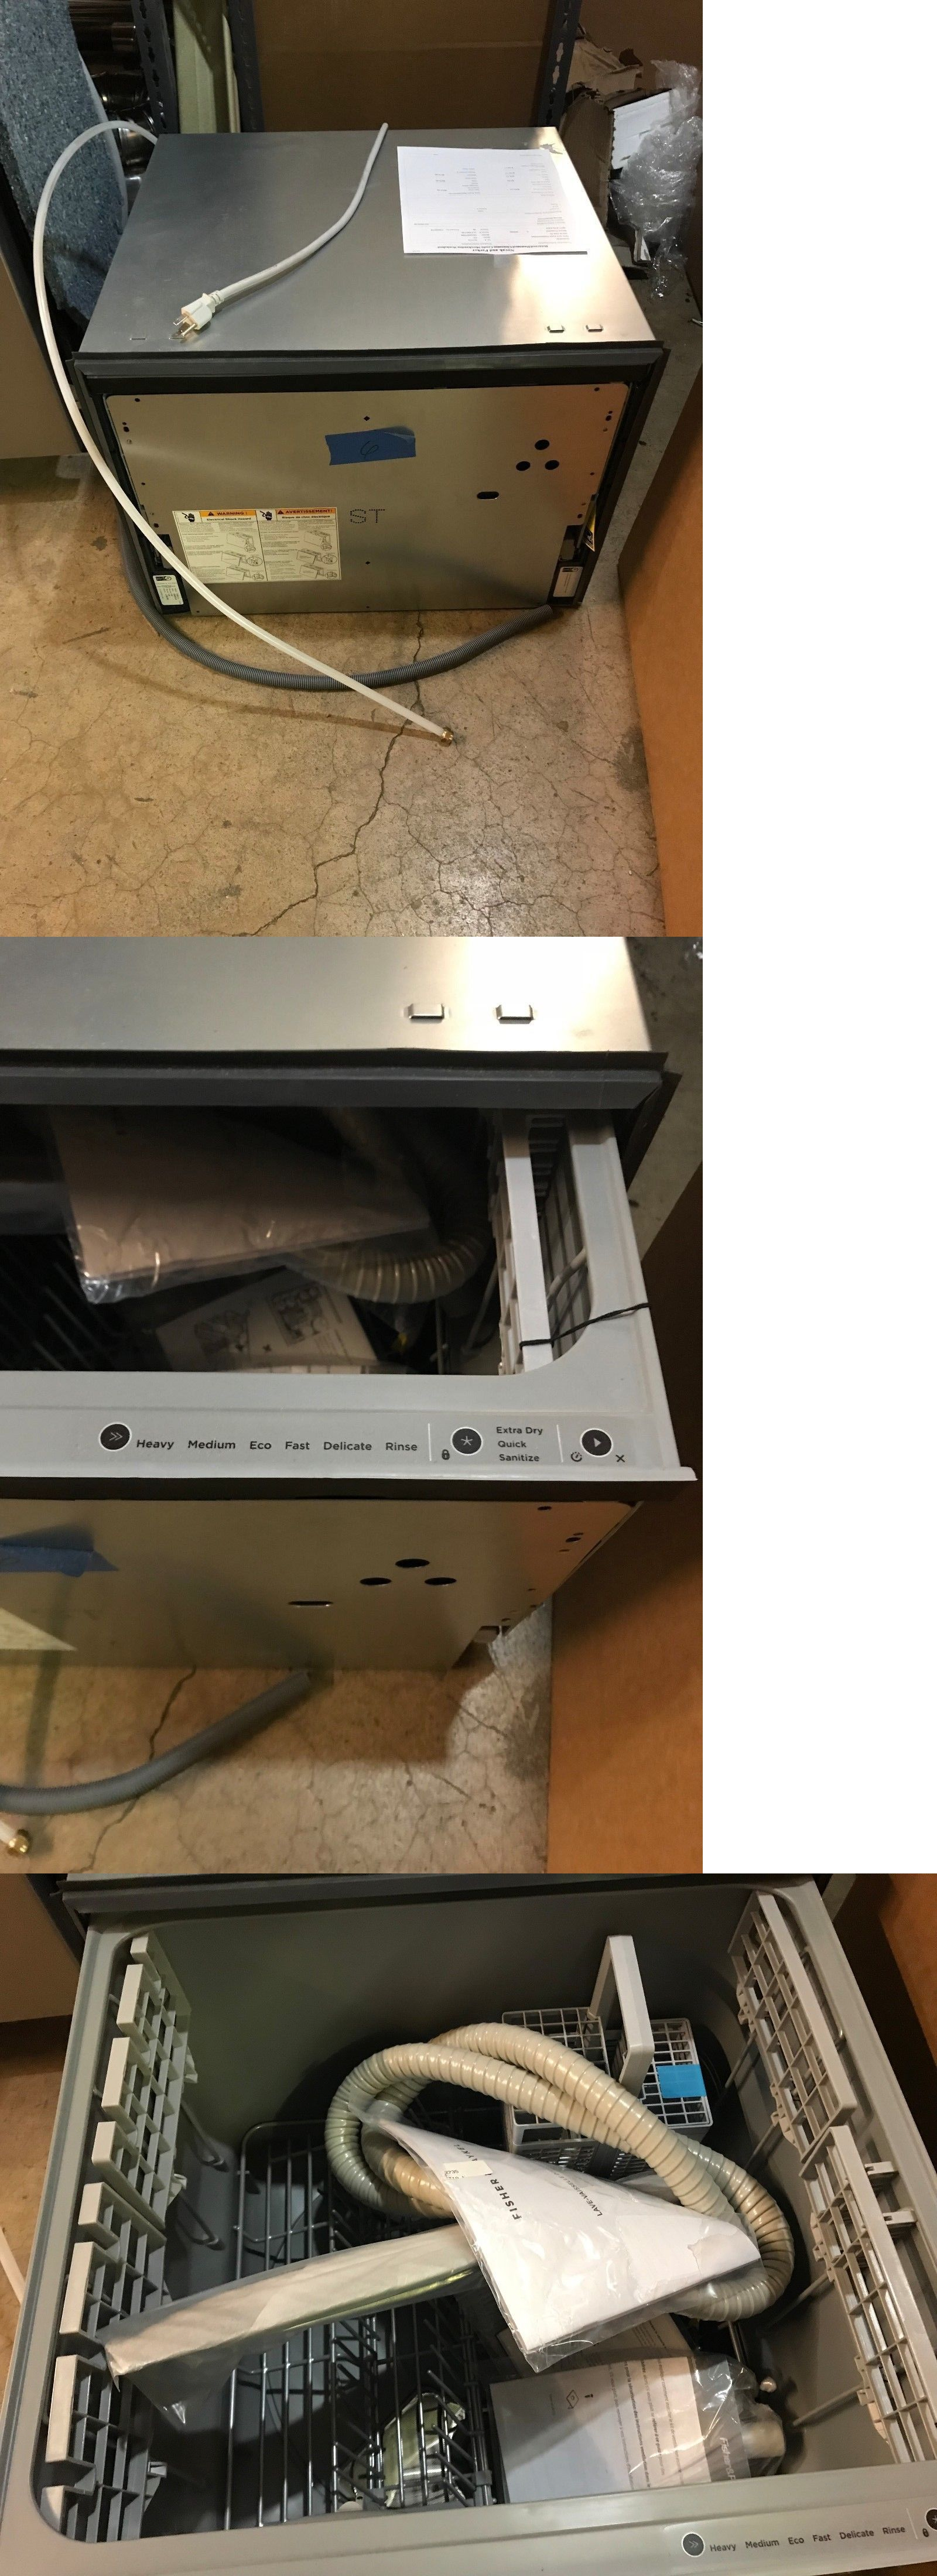 Dishwashers 116023 Fisher And Paykel Dishdrawer Series Dd24sti9n